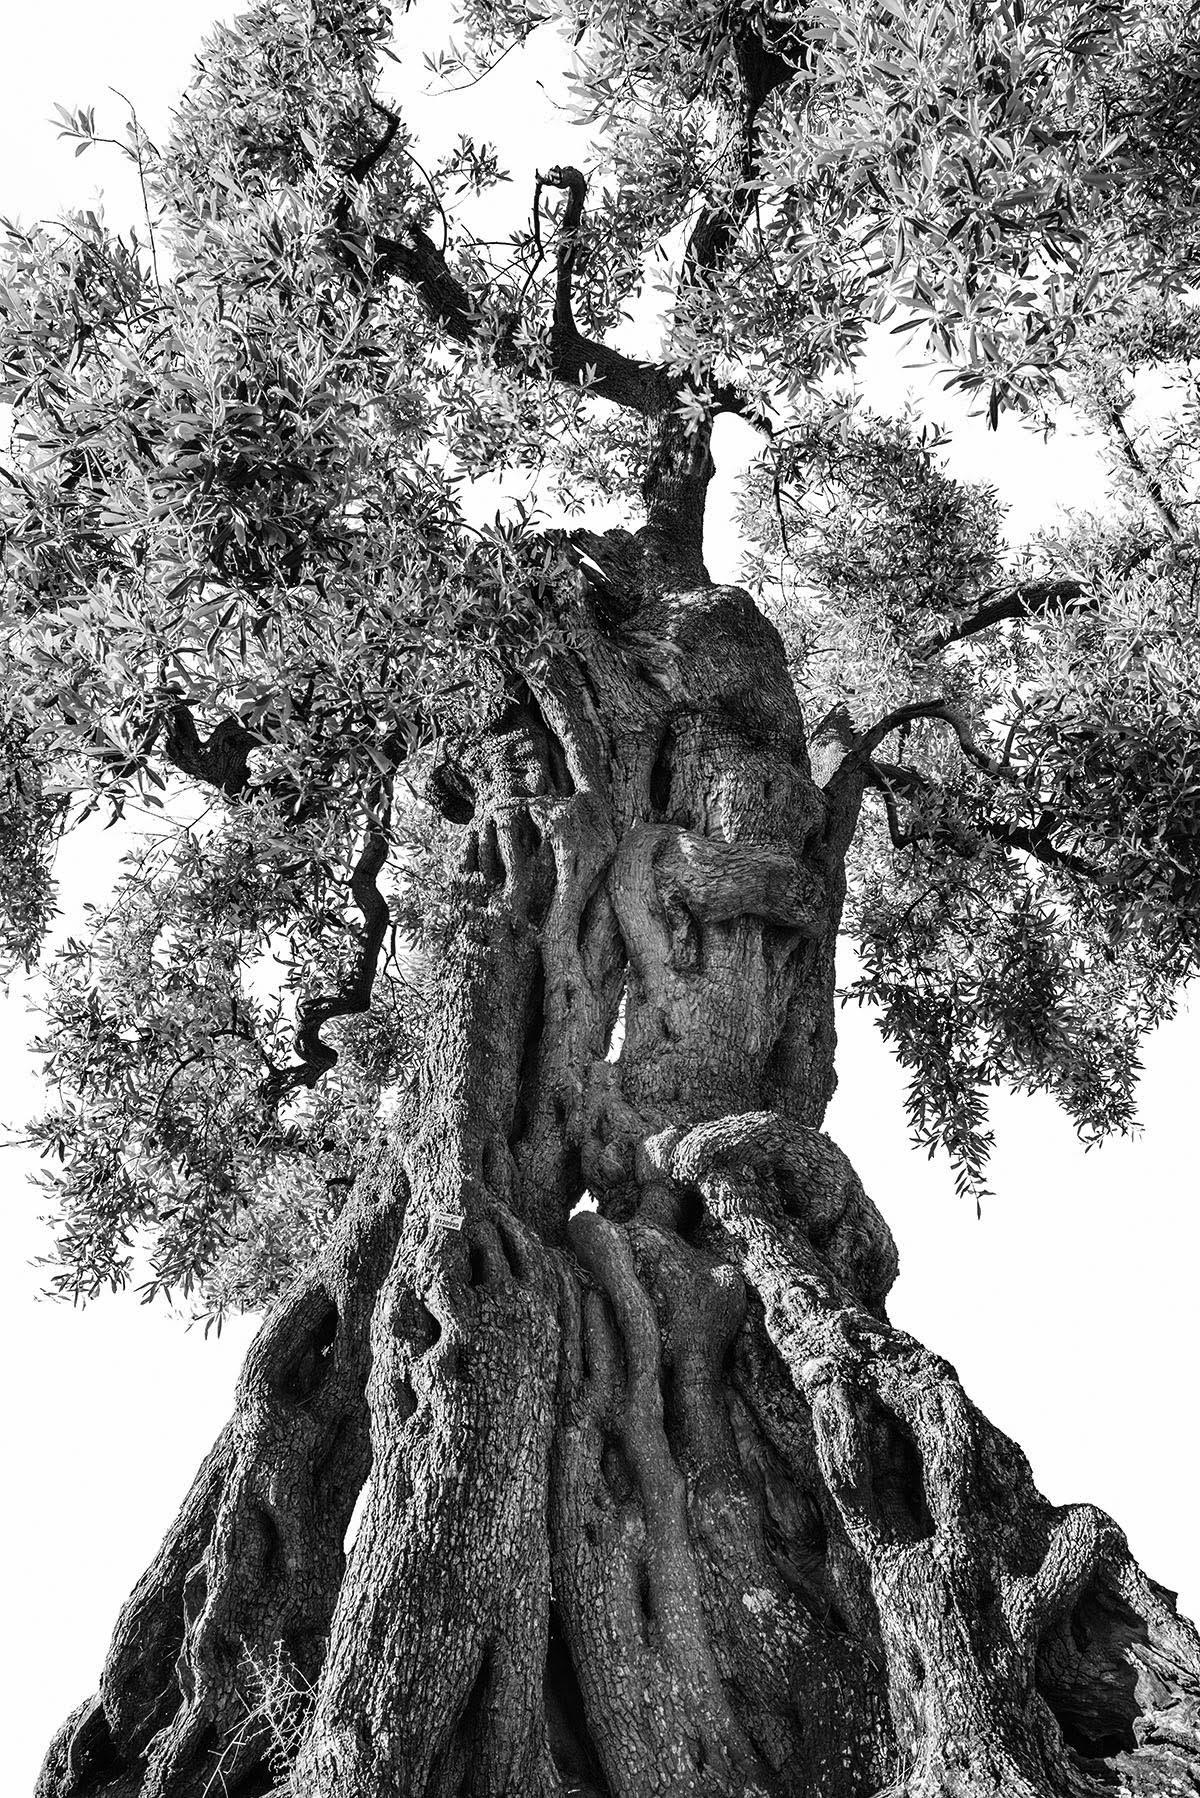 martin-ogolter-Monumentali-nature-landscape-photographer-16